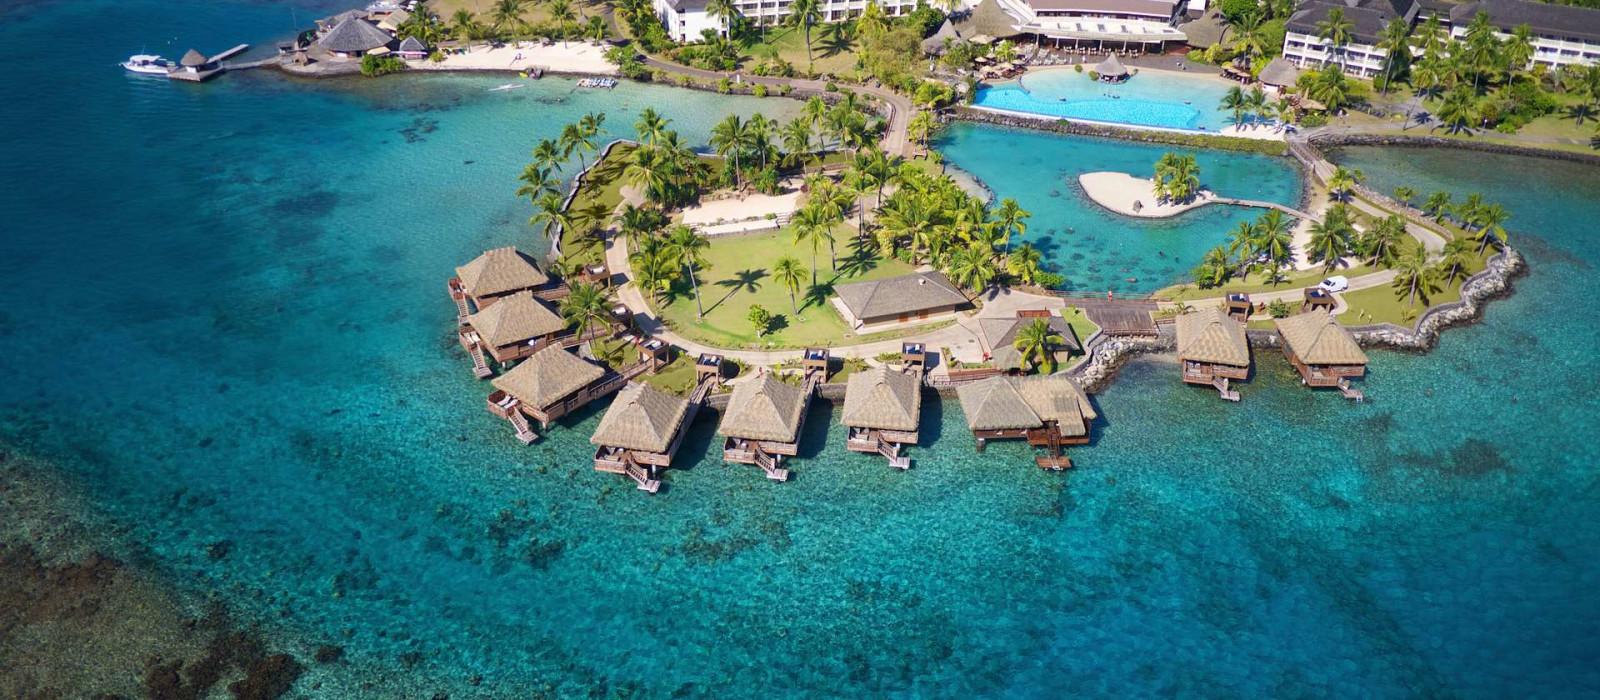 Hotel InterContinental Tahiti Resort & Spa French Polynesia